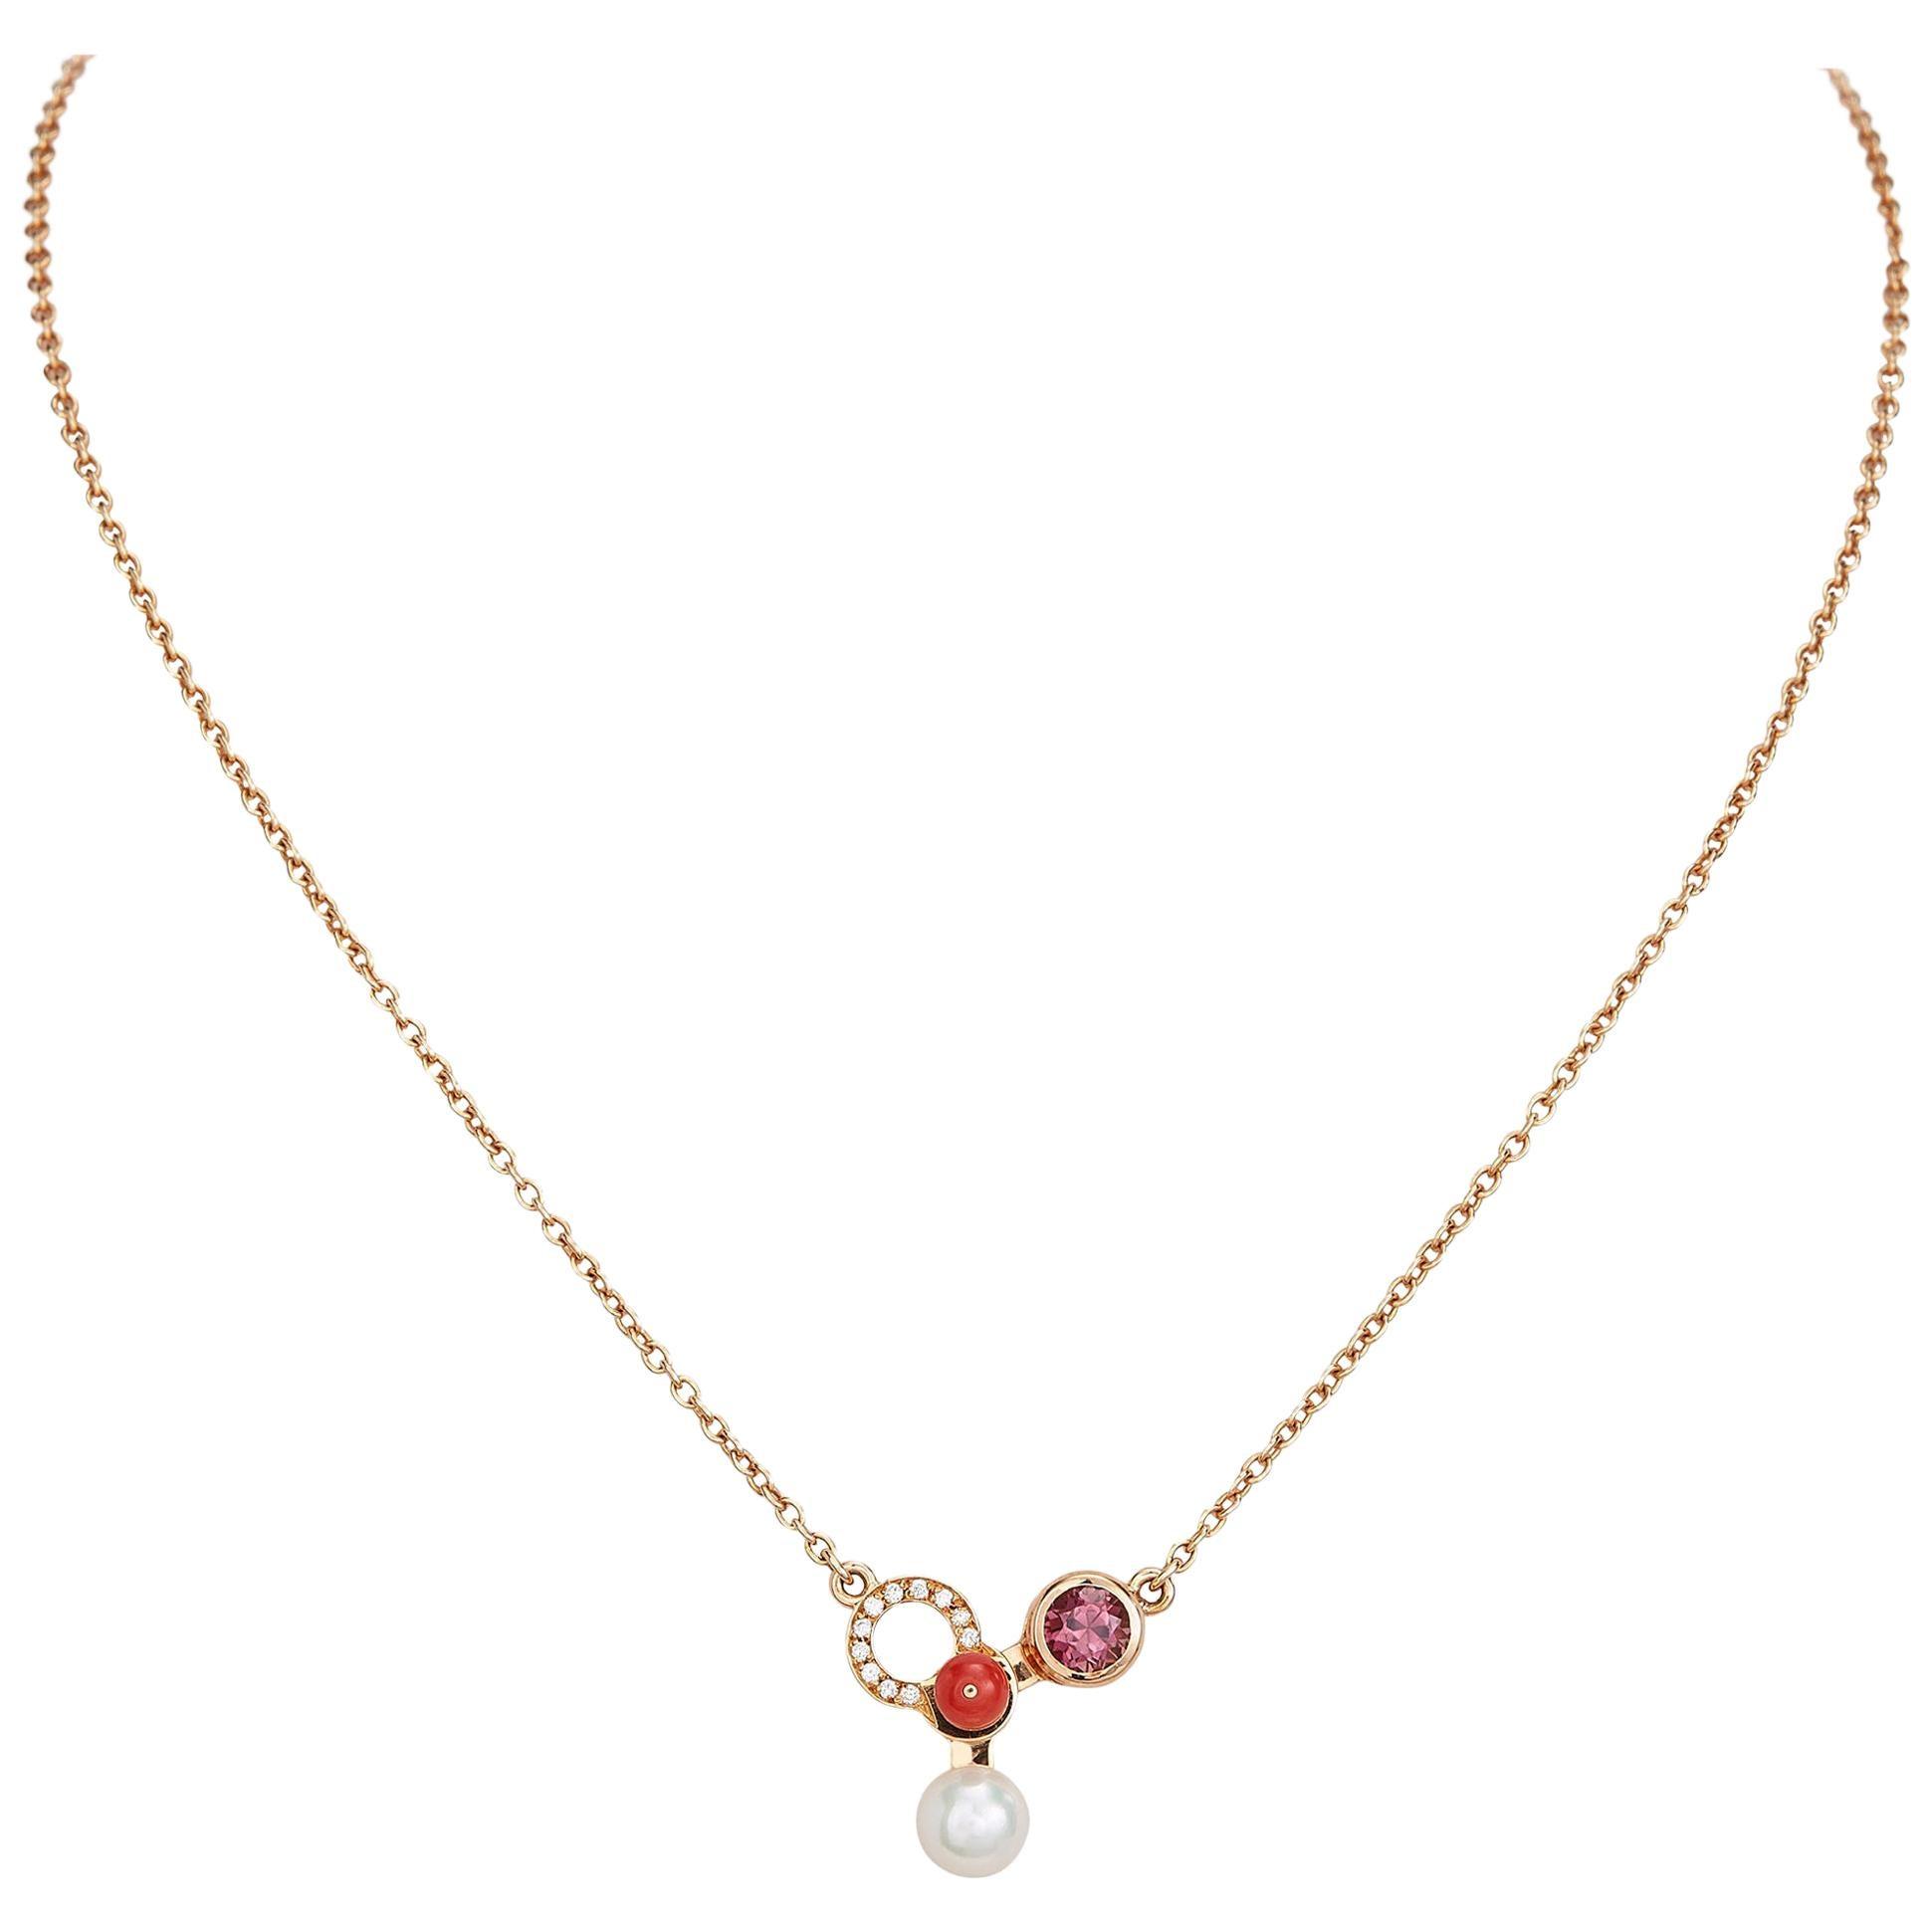 Nathalie Jean Diamond Tourmaline Pearl Carnelian Gold Pendant Necklace